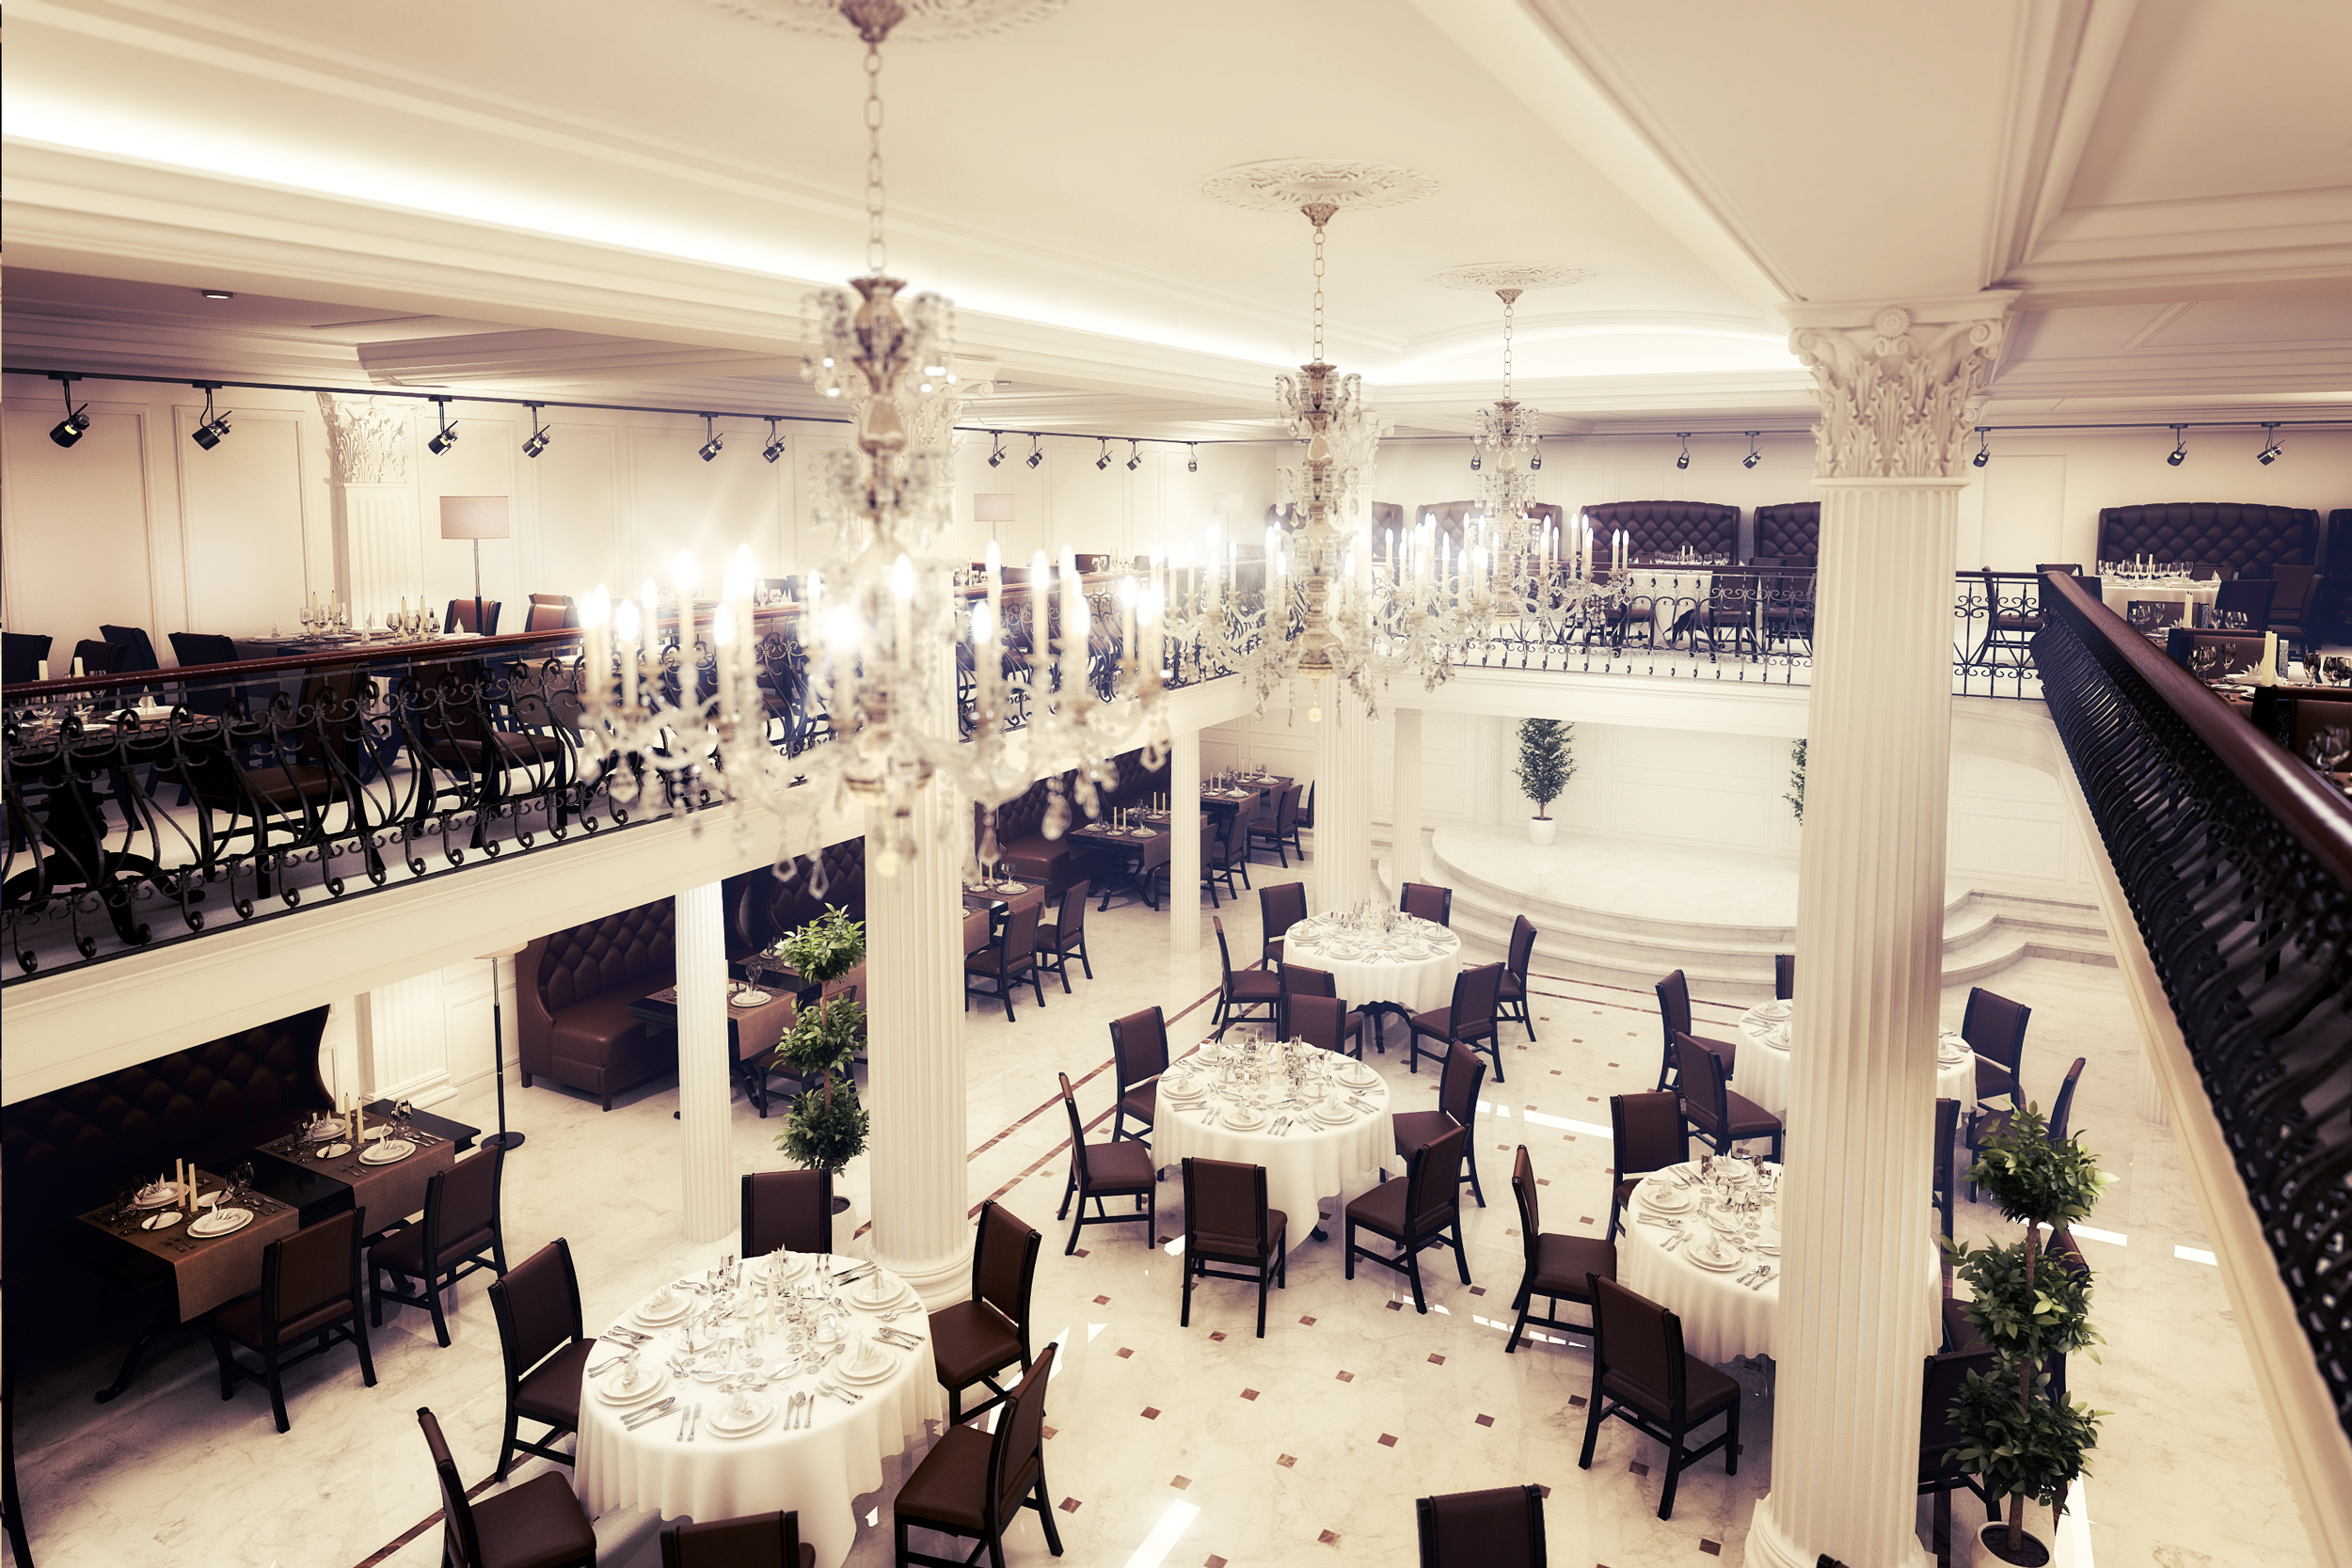 11_Ресторан БЛубянка.jpg